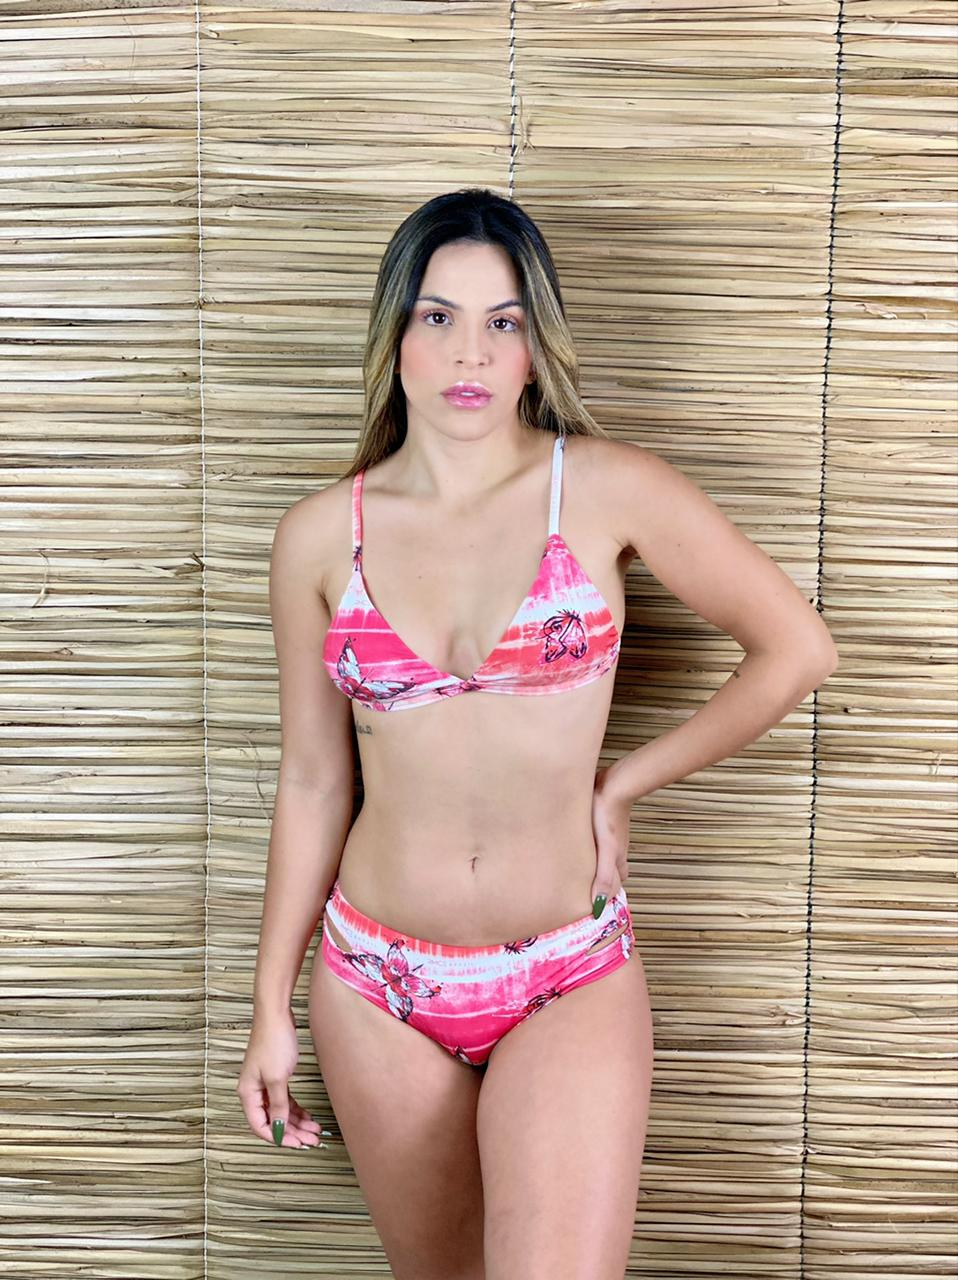 Calcinha Biquíni Dupla Aberta Butterfly   - RMCE BRAZIL